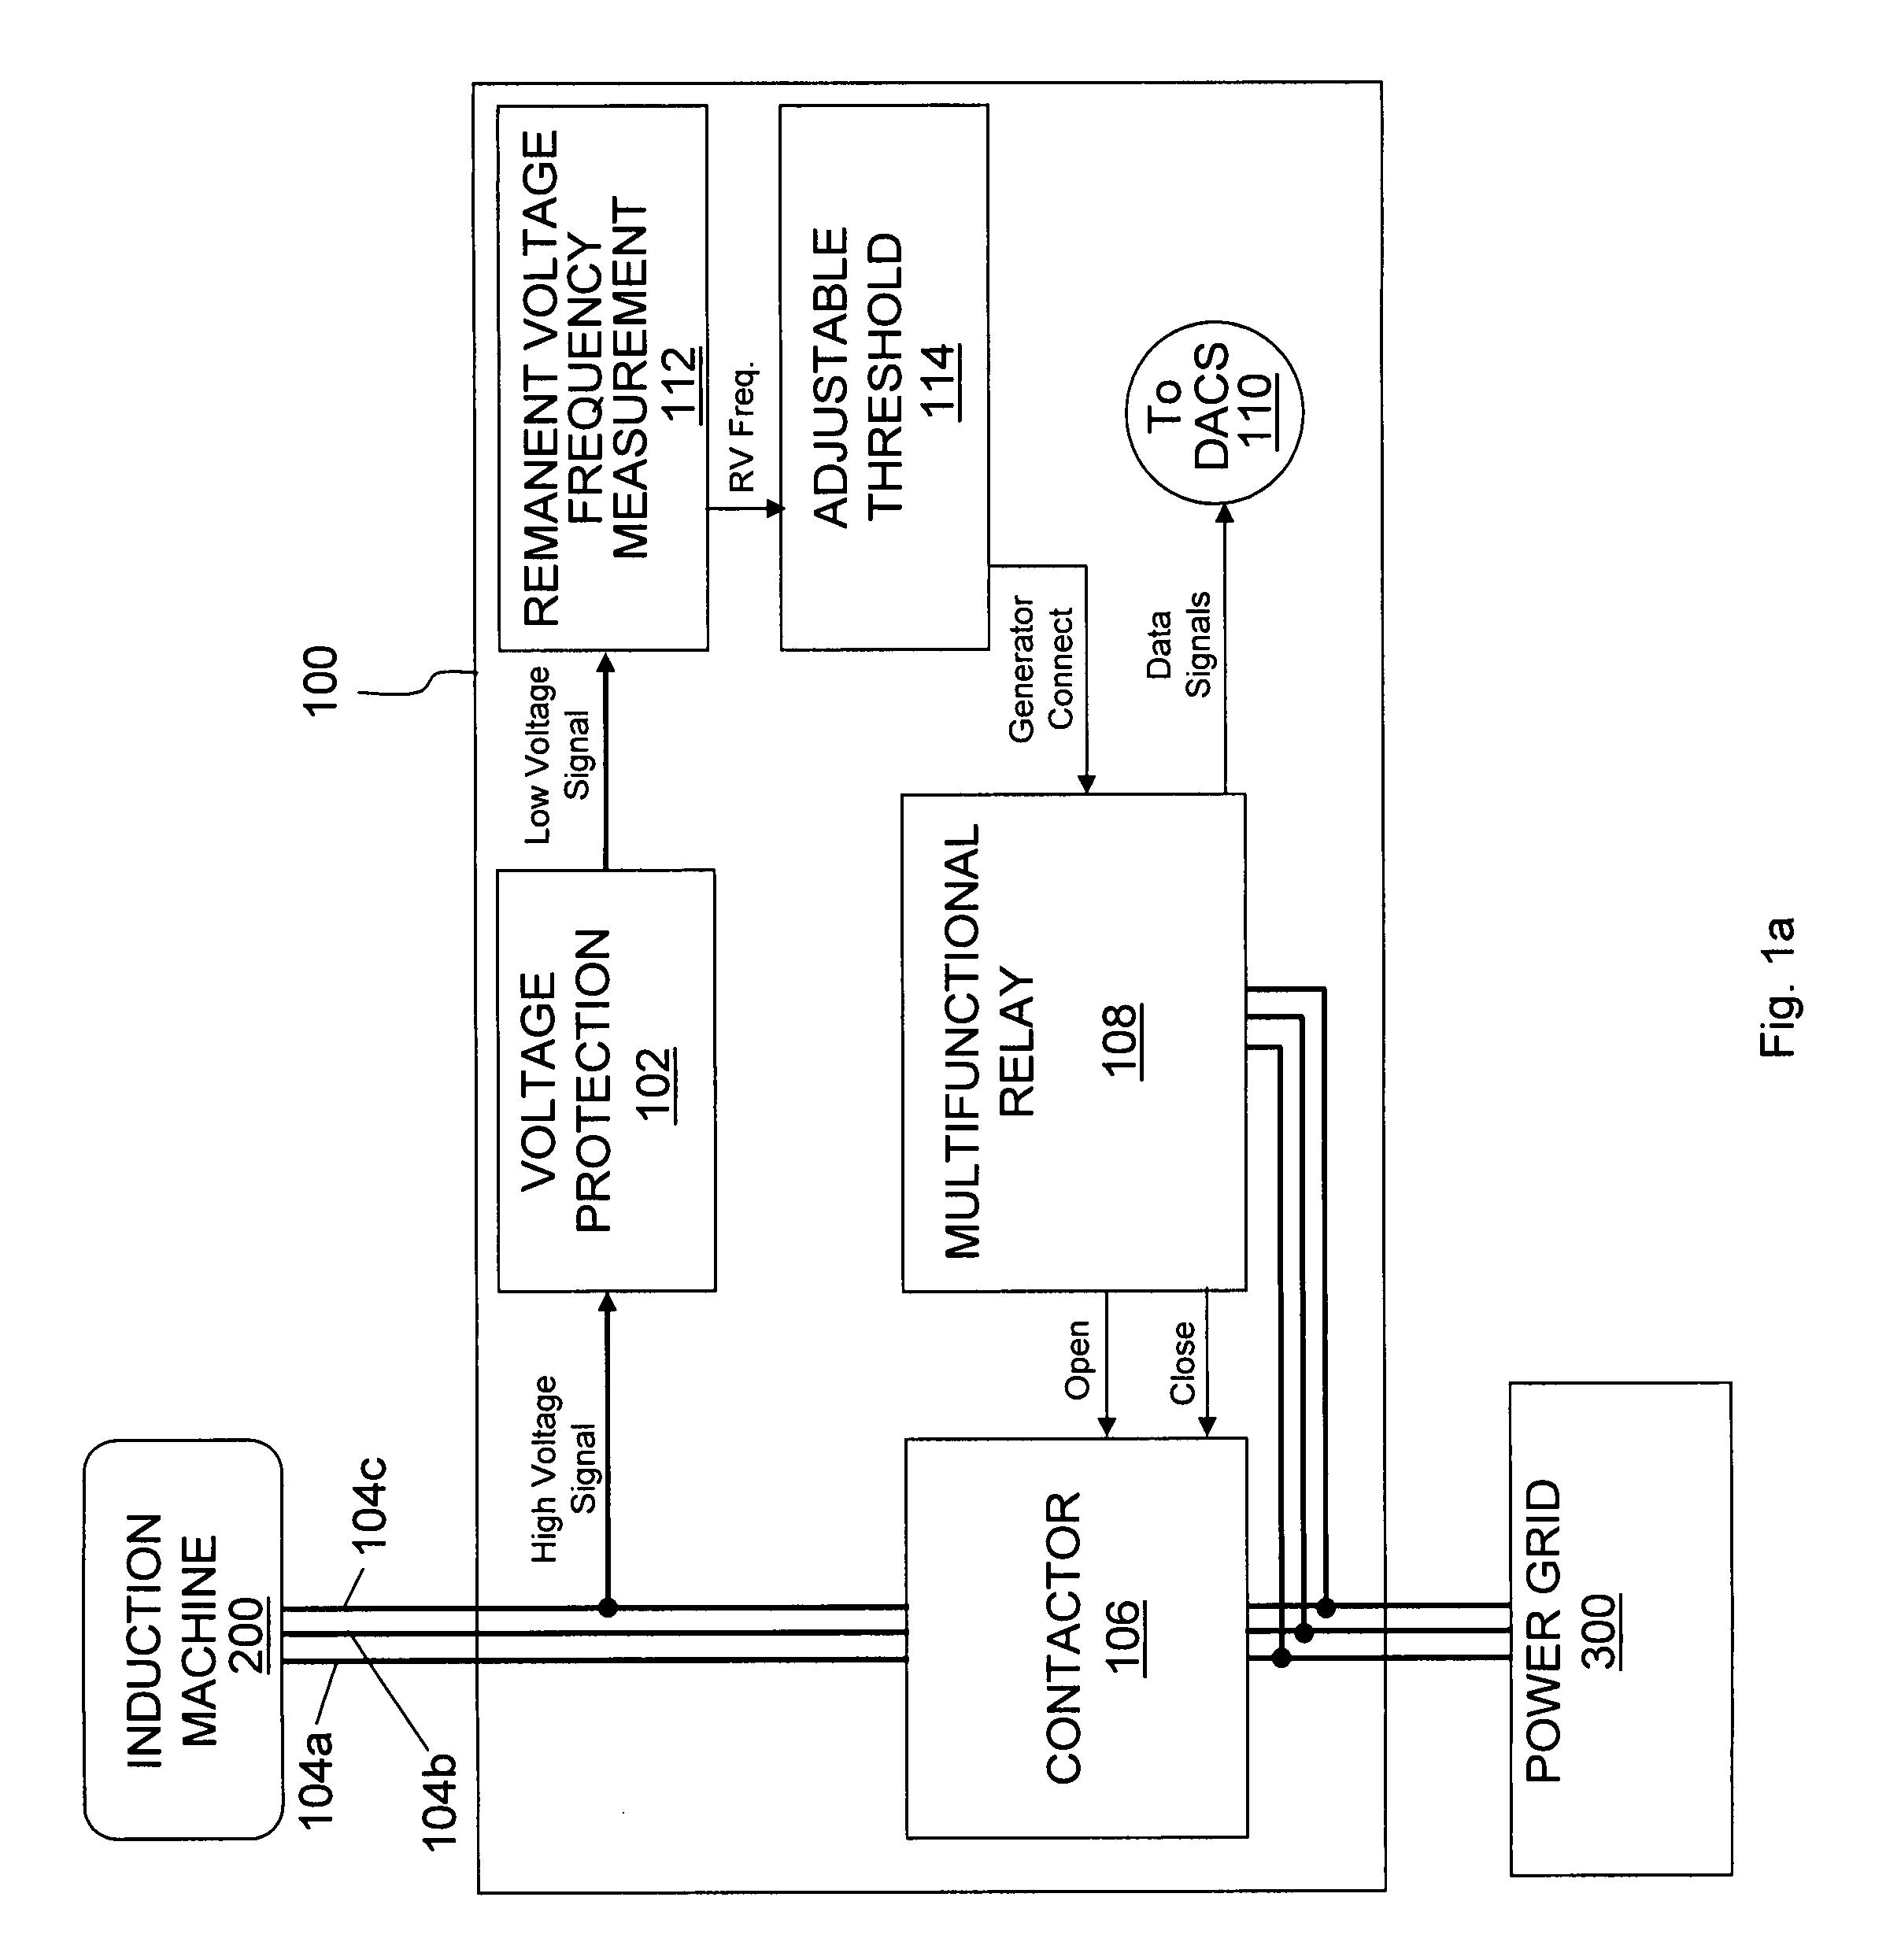 patent us7877170 remanent voltage generator tachometer and control